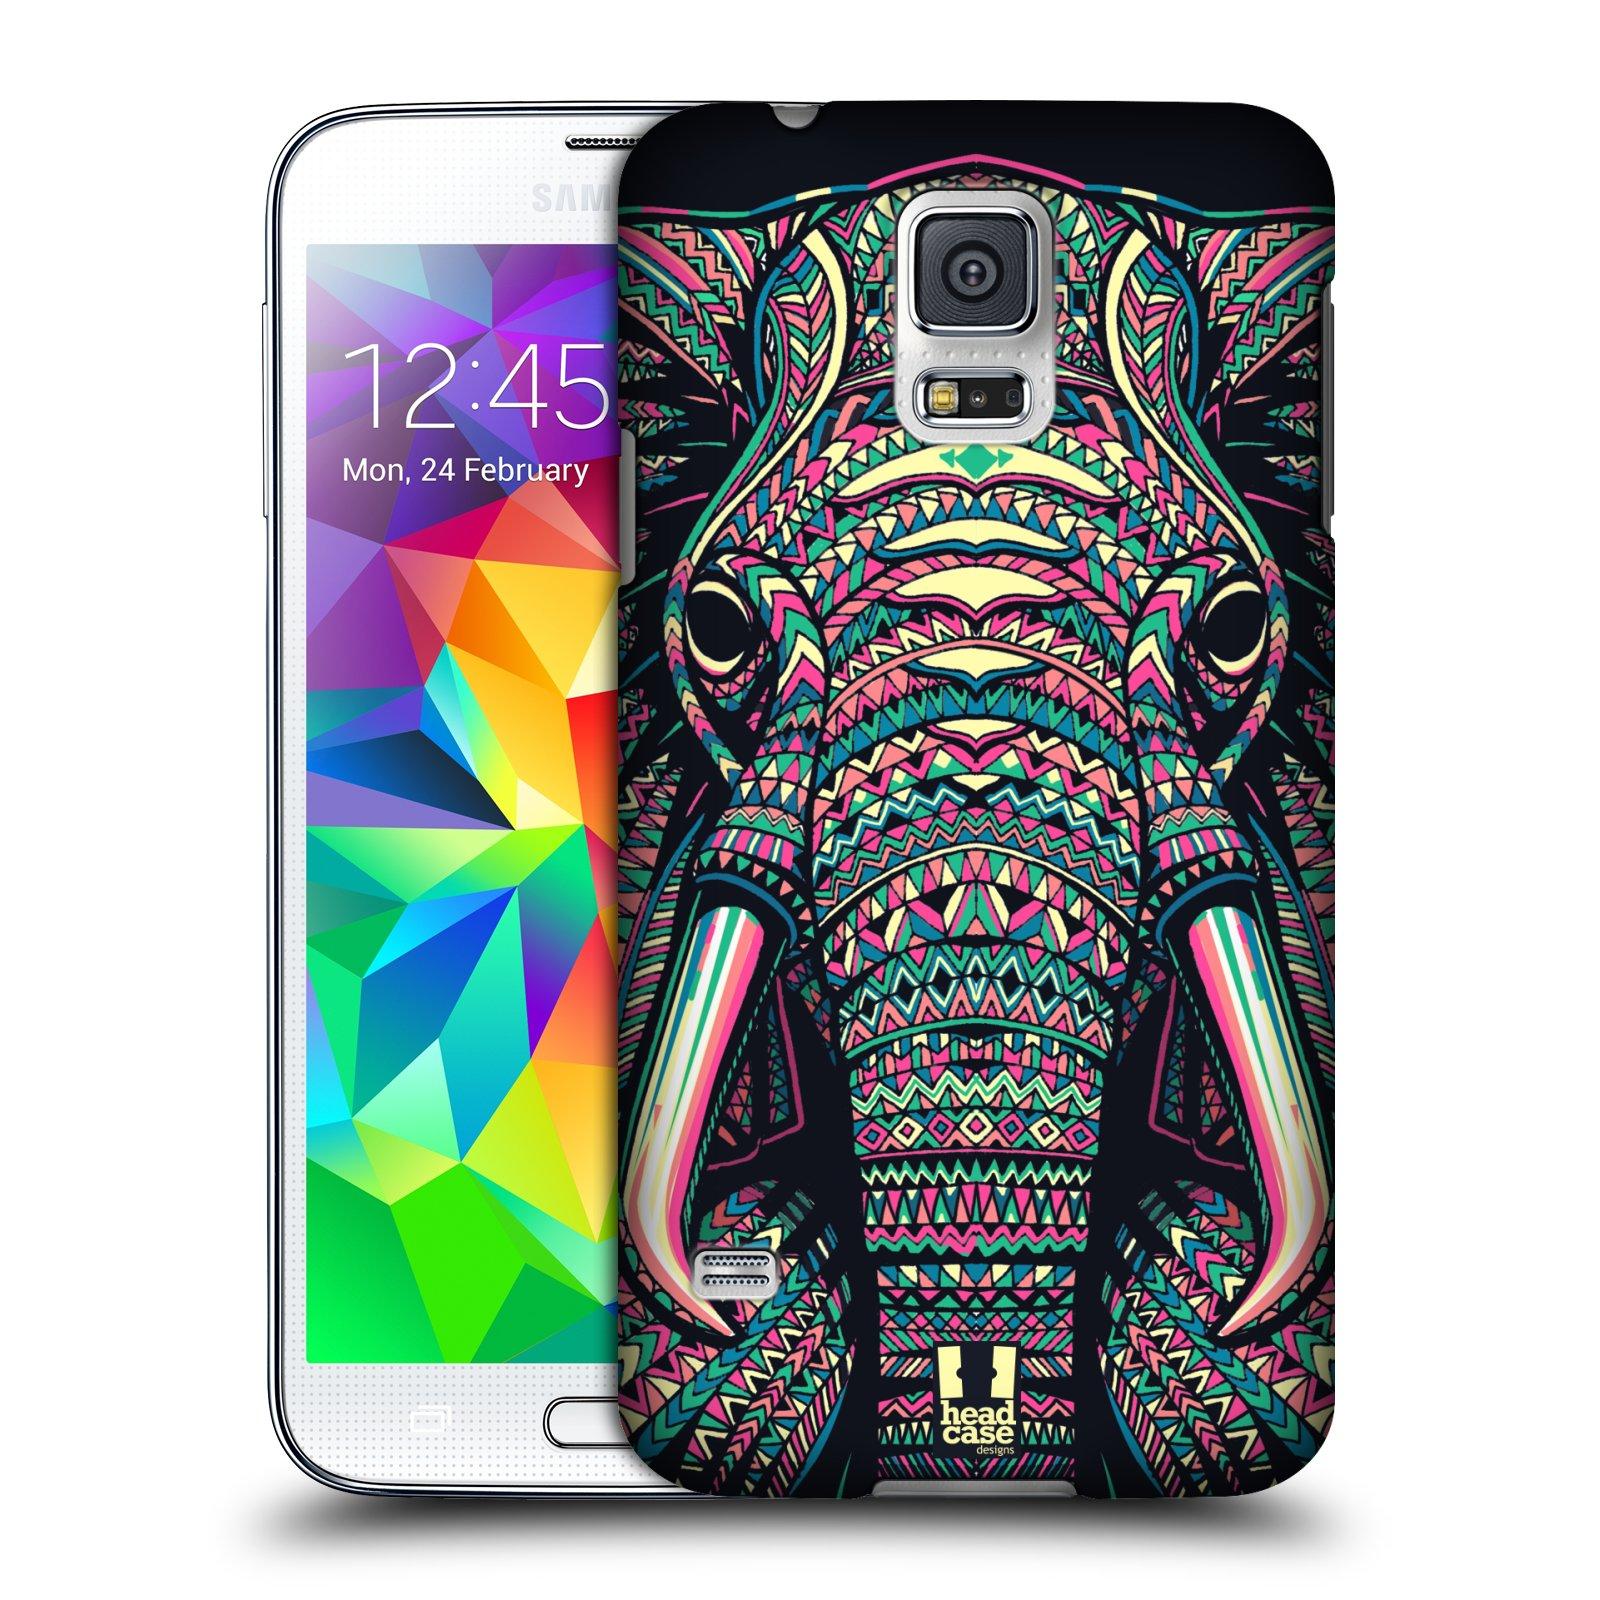 Plastové pouzdro na mobil Samsung Galaxy S5 HEAD CASE AZTEC SLON